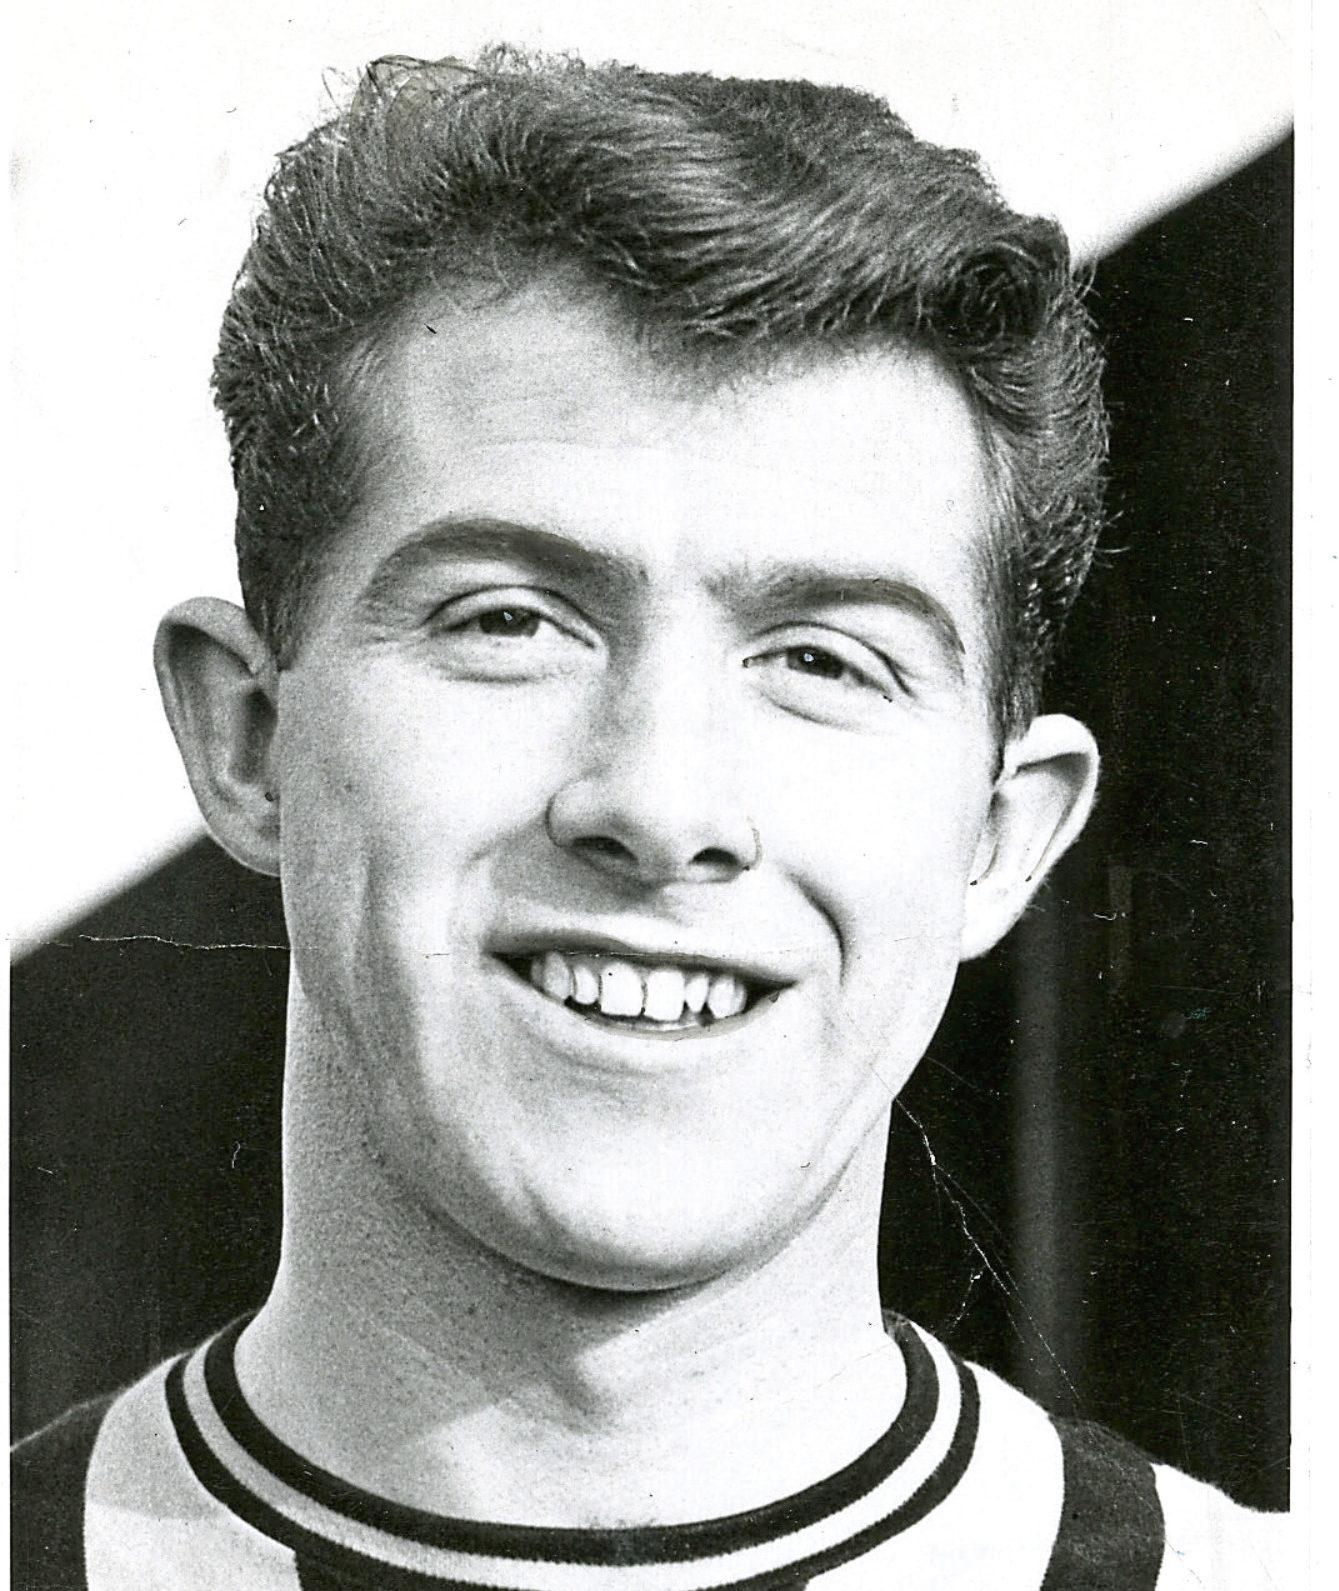 Harry Smith